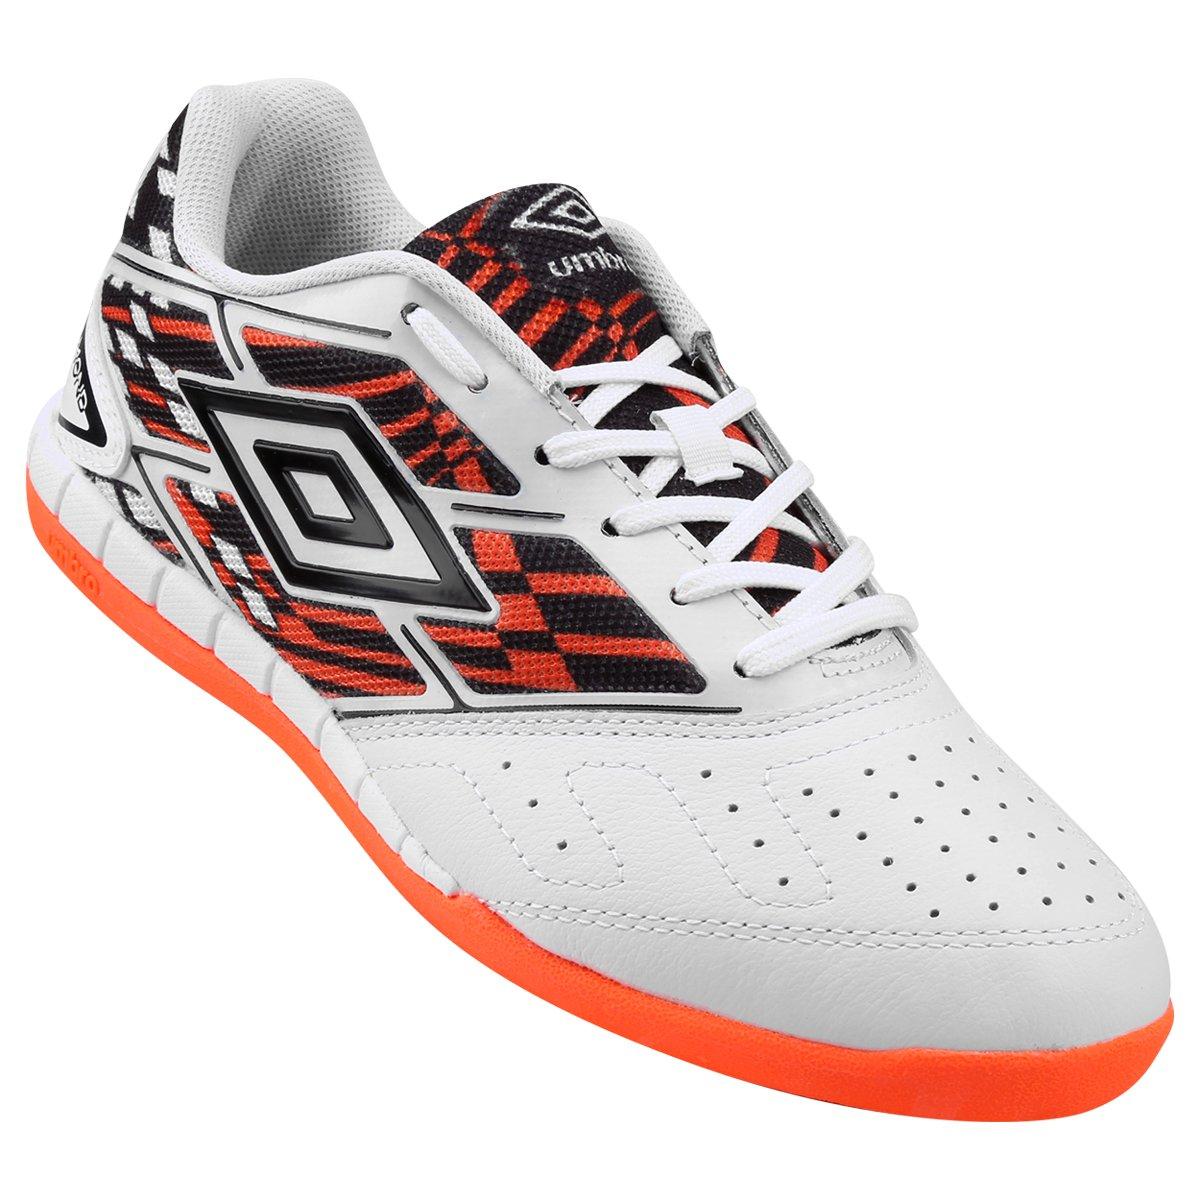 6a92fe70d881b Chuteira Futsal Umbro Diamond Masculina - Compre Agora